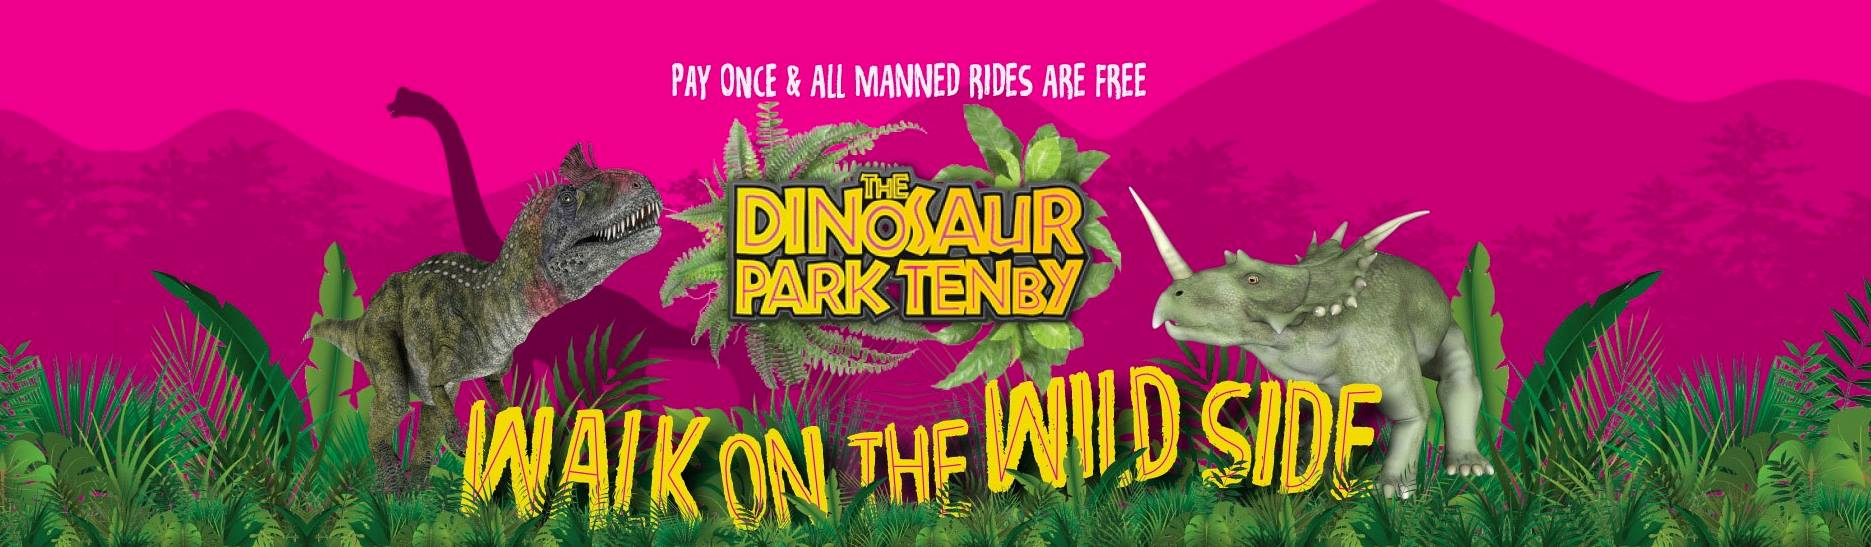 Dinosaur Park Featured - Size